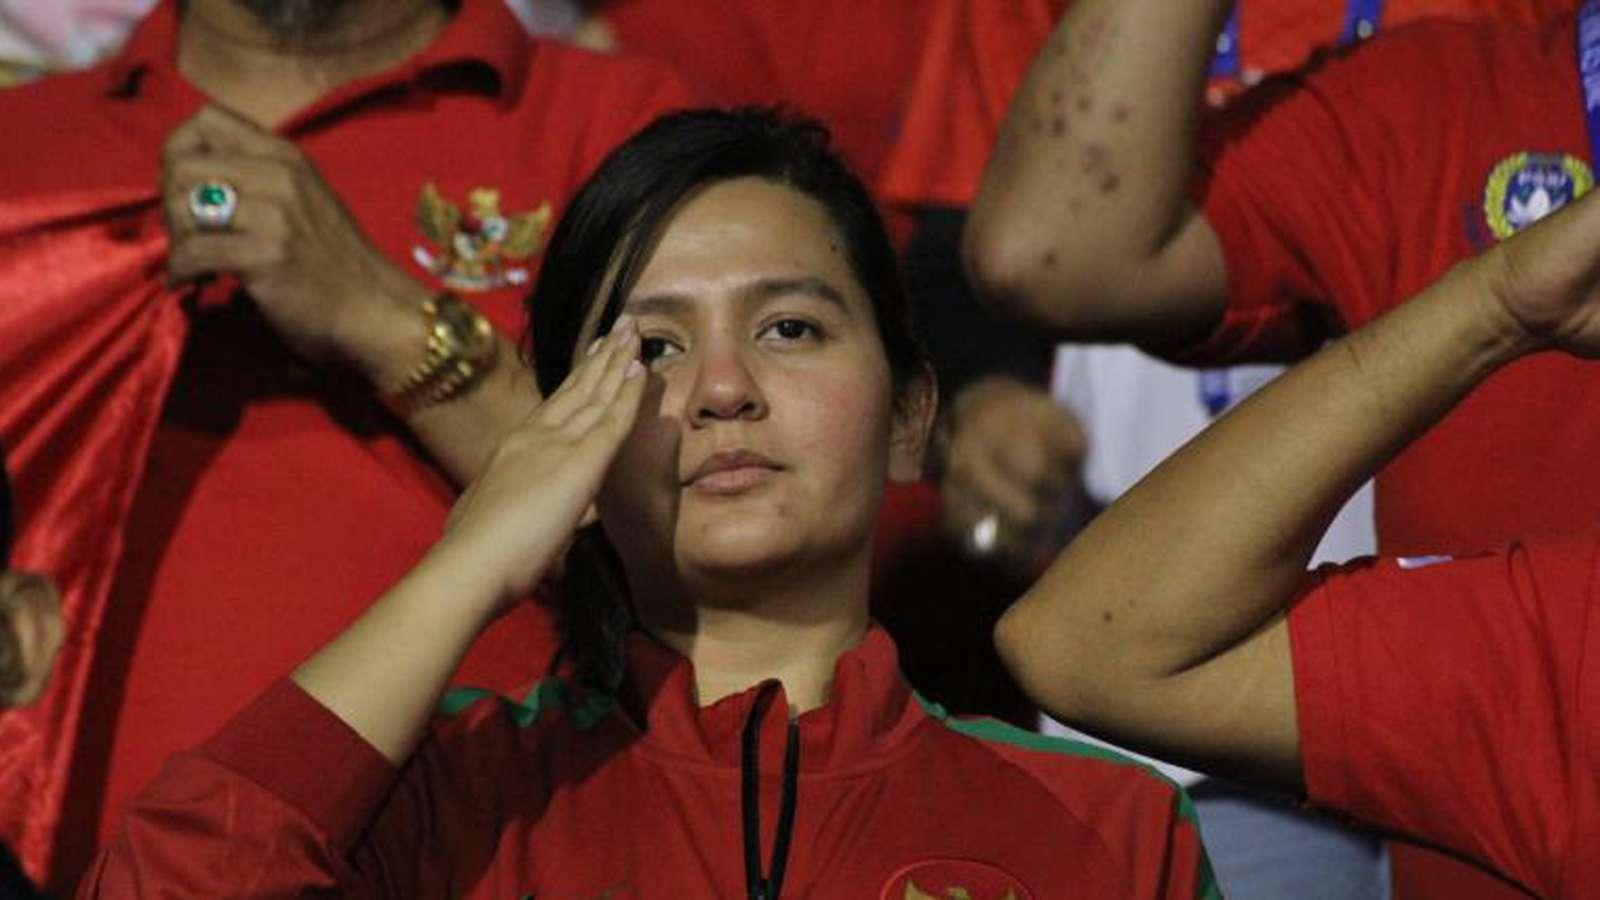 Ganesport Institute: Pengganti Ratu Tisha Wajib Paham Sepakbola Secara Menyeluruh